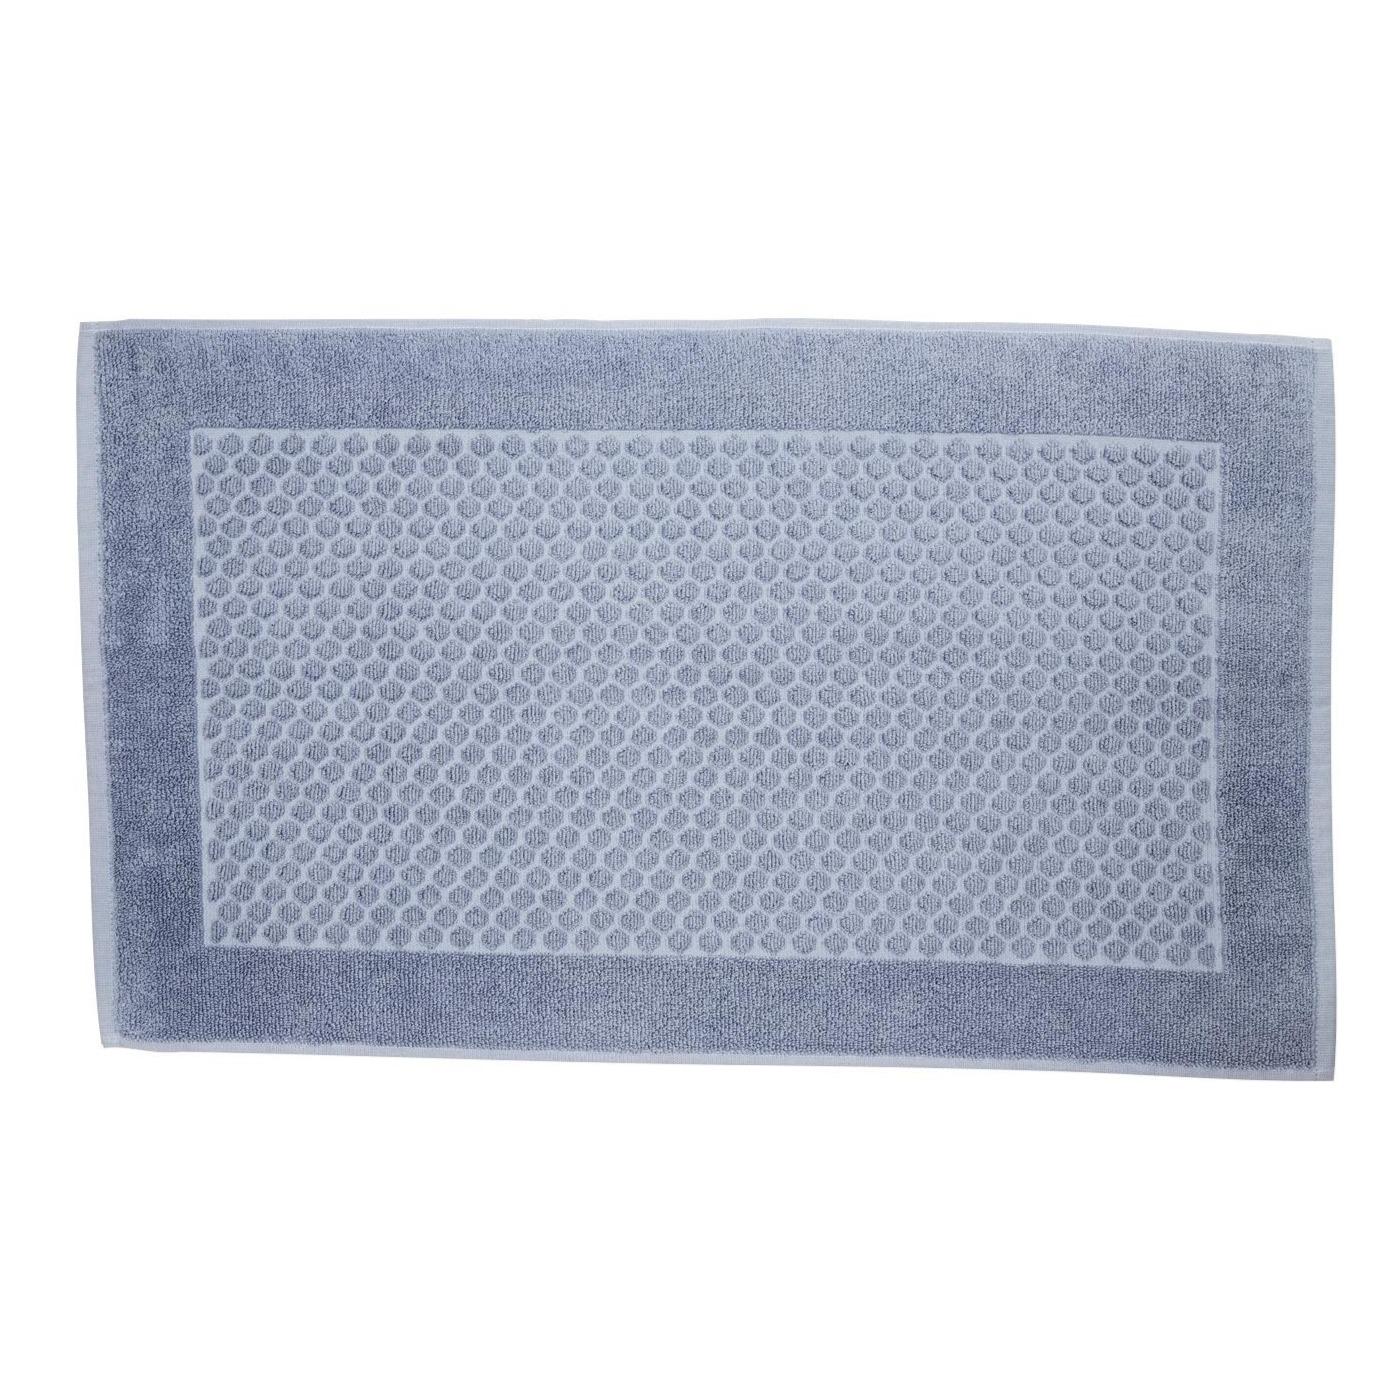 Toalha de Piso Total Mix 45x75 cm 100 Algodao Azul Denin - Artex